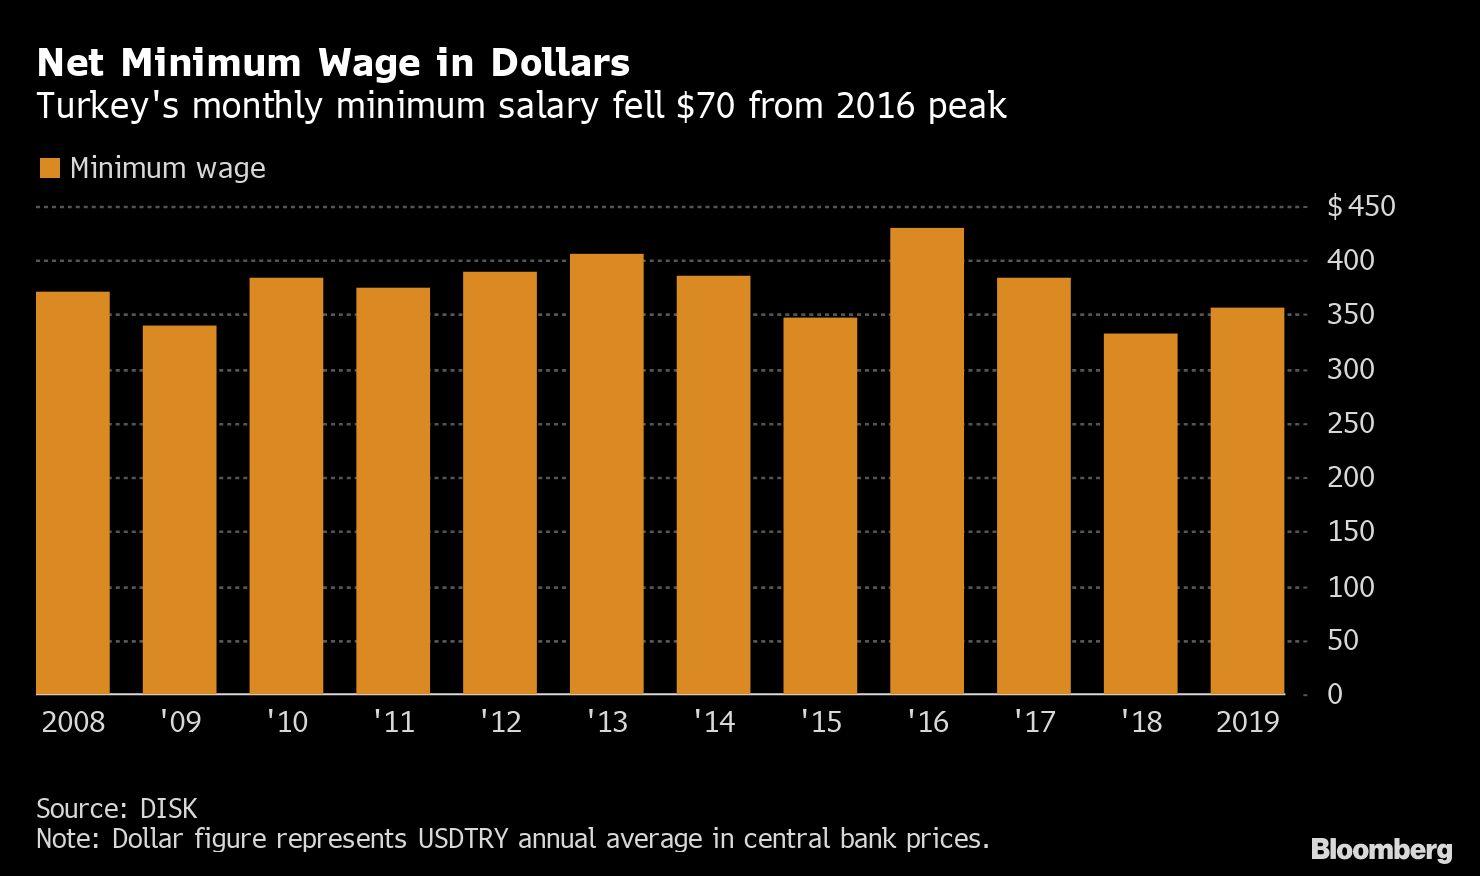 Turkey Raises Net Minimum Wage by 15% for 2020